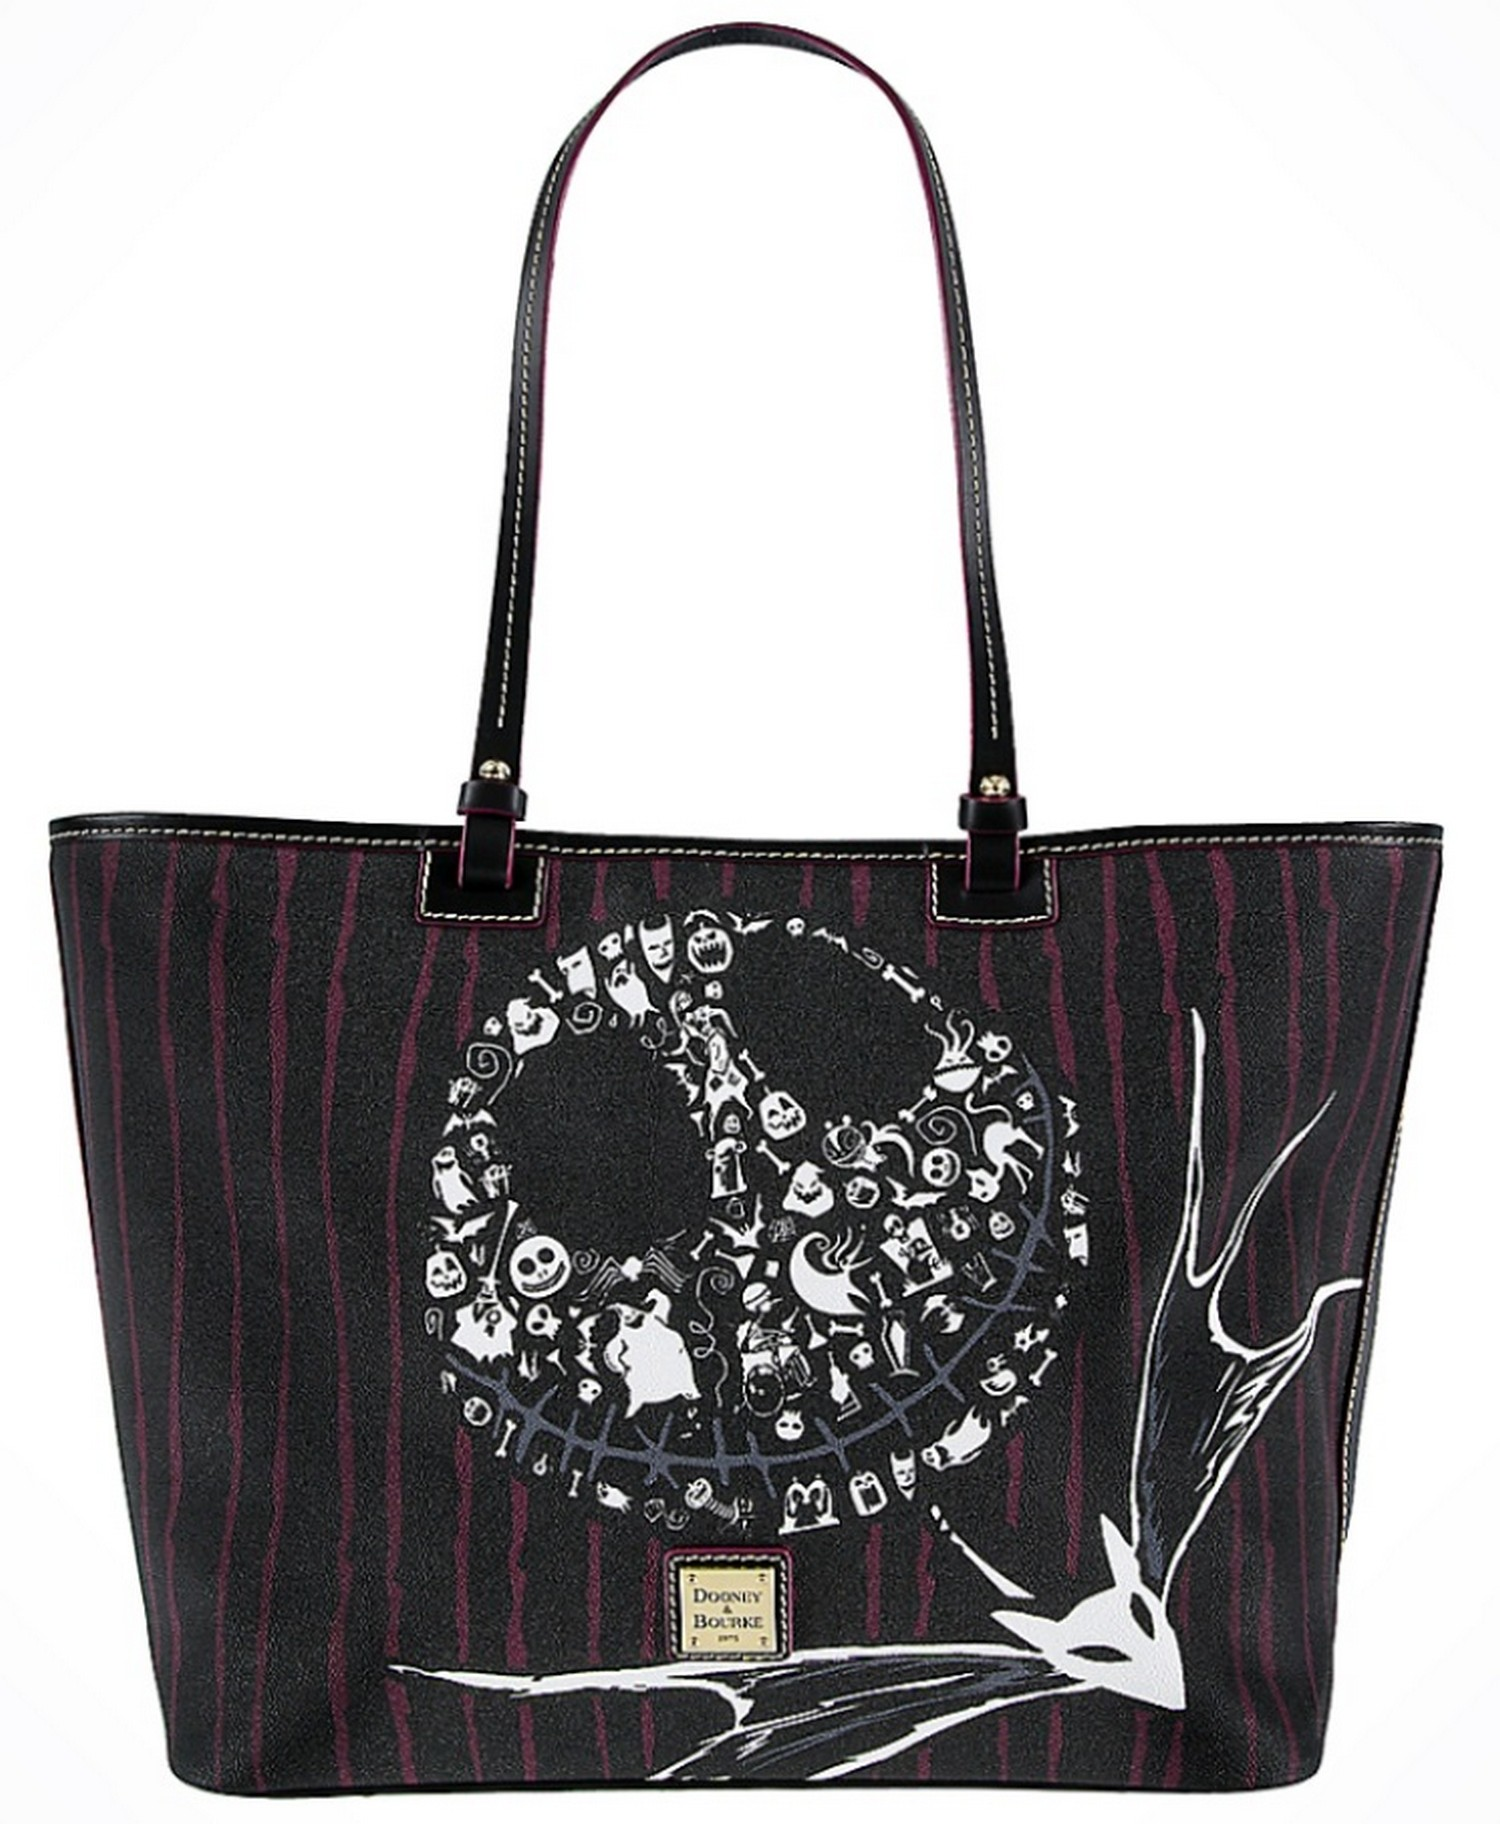 Dooney & Bourke - The Pumpkin King Tote Handbag - The Nightmare Before Christmas © Dizdude.com